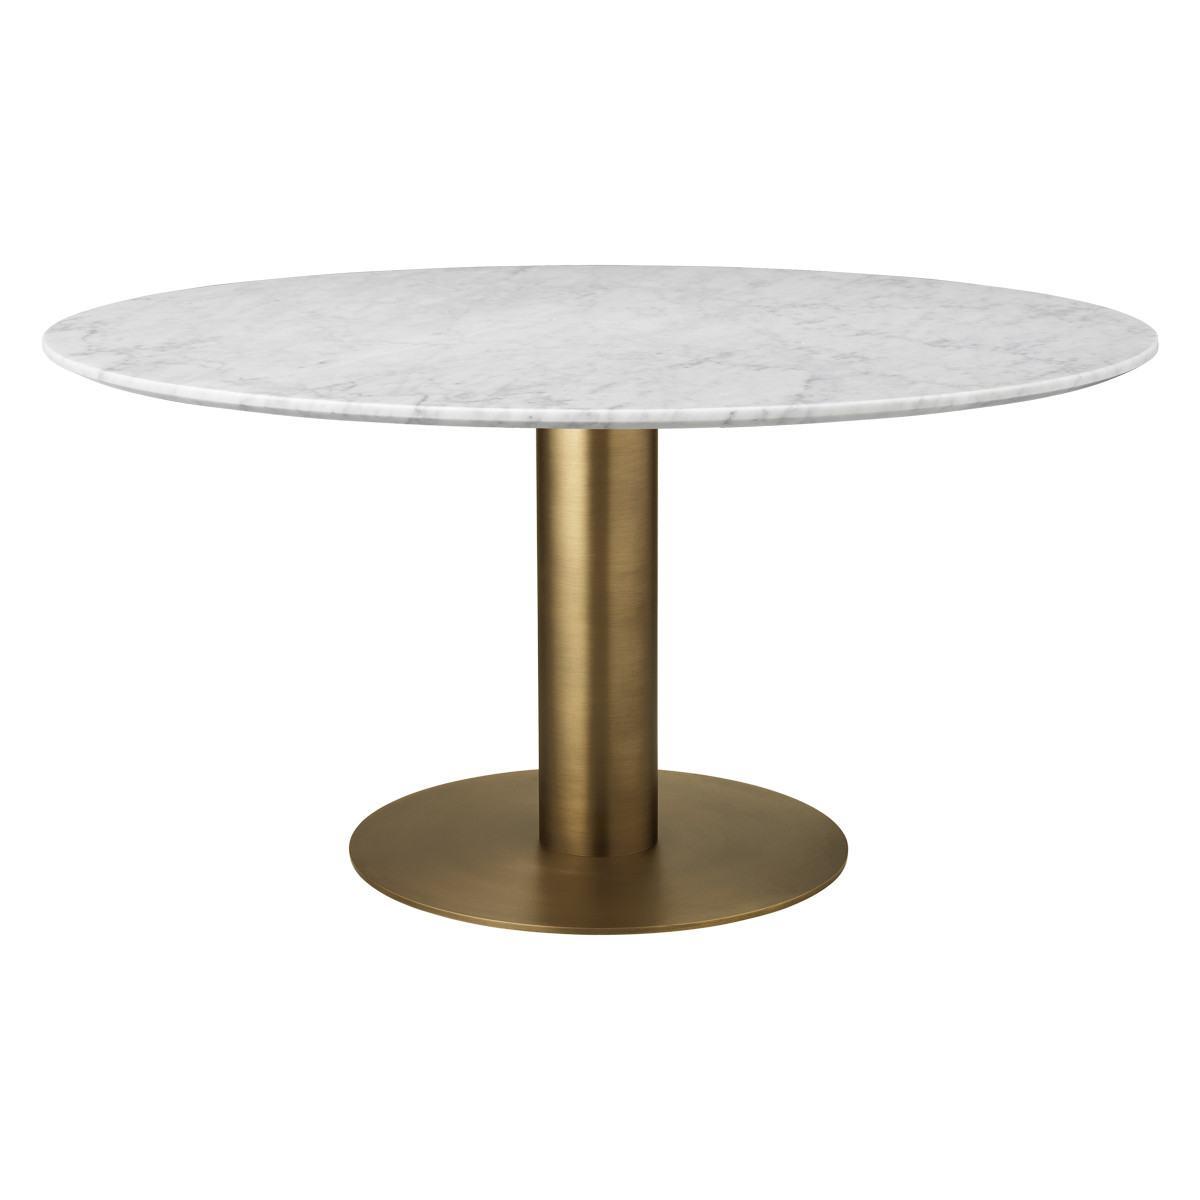 Gubi 2.0 Dining Table - Round, 150cm Diameter